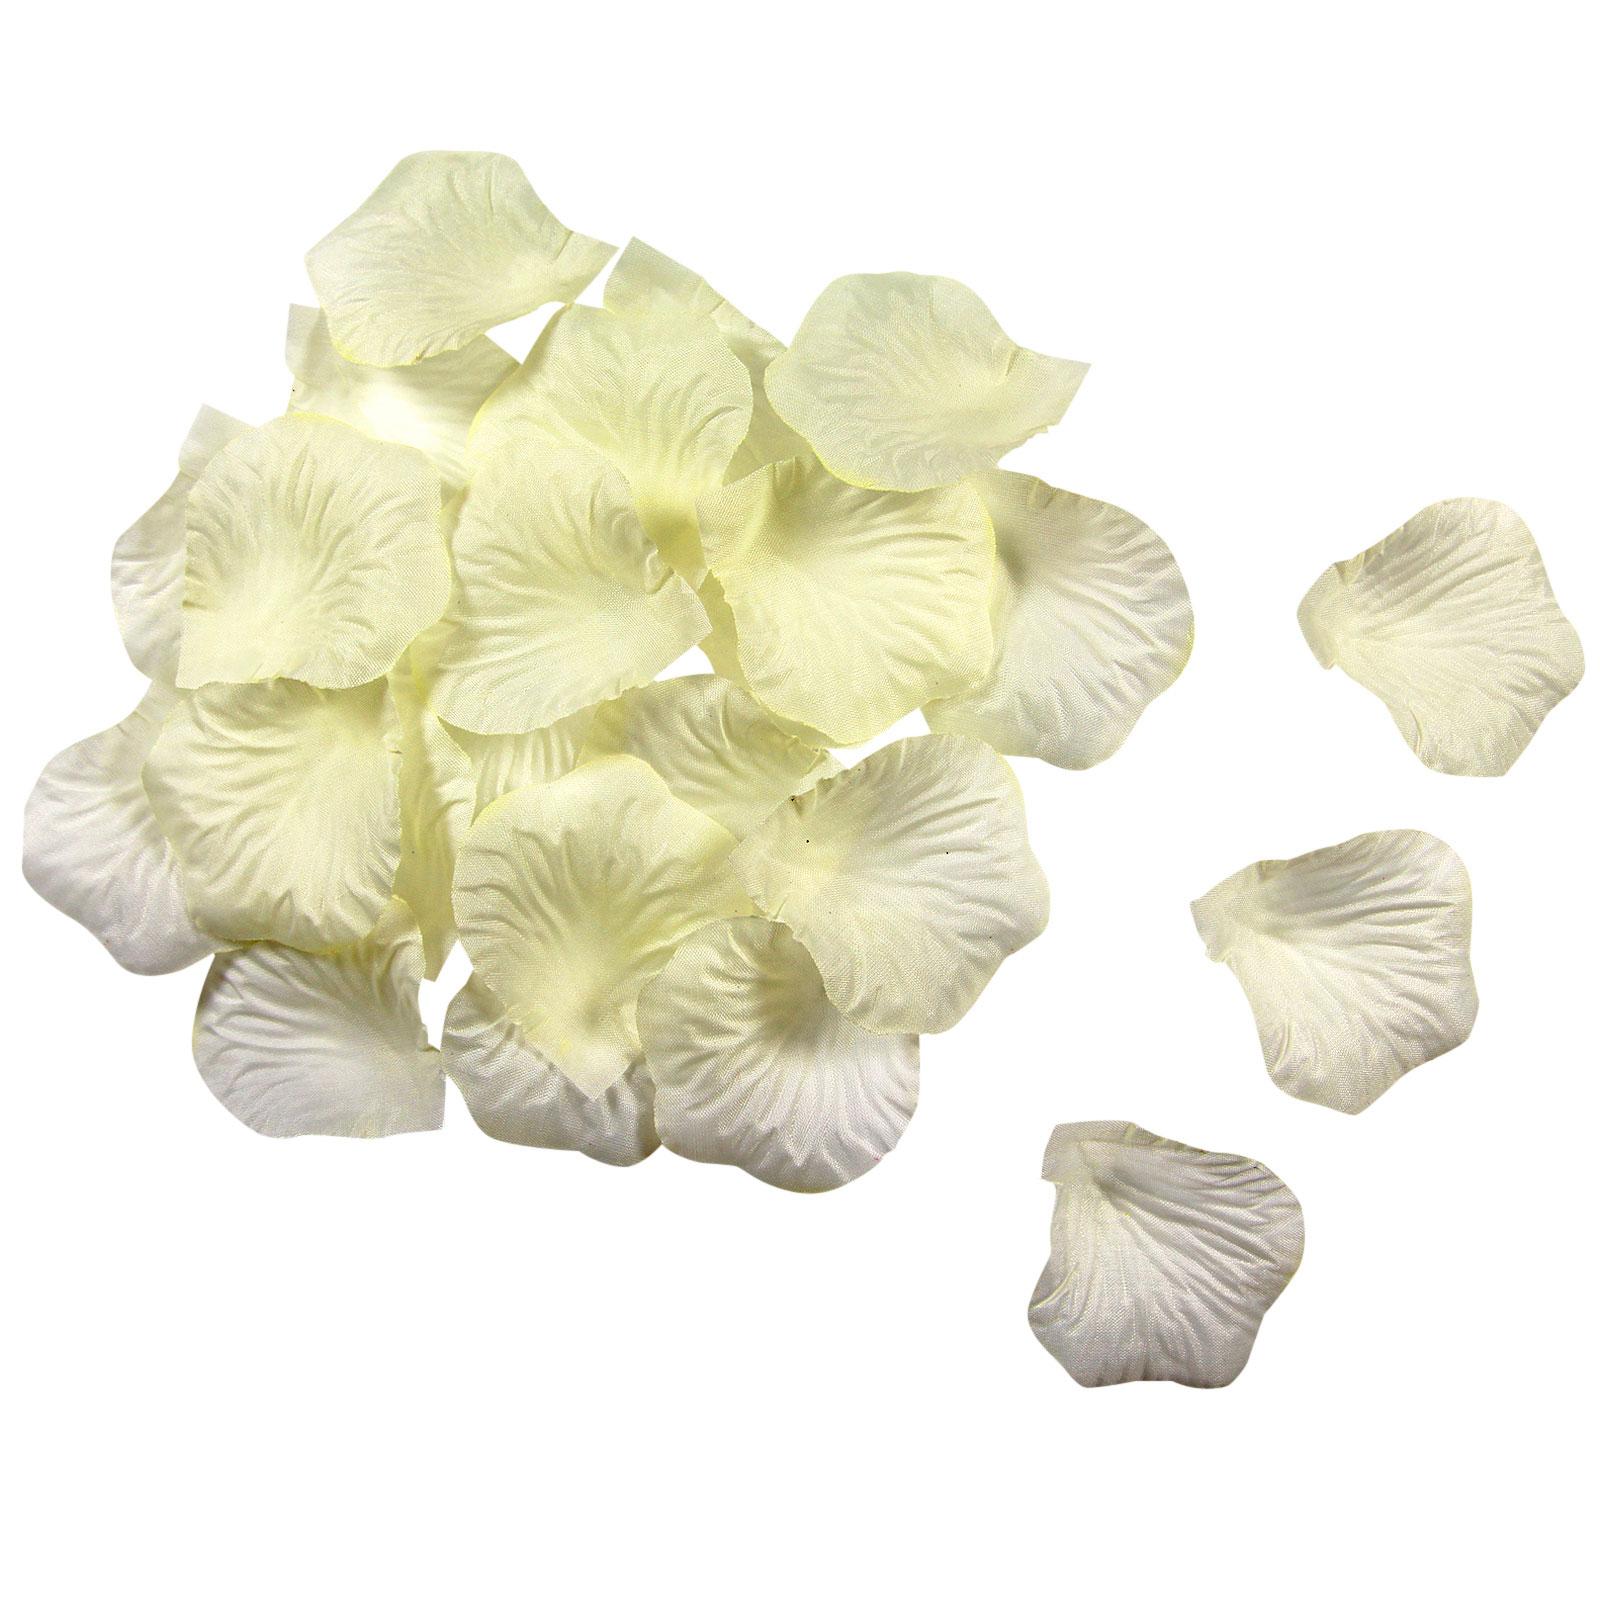 100 to 2000 silk rose petals wedding celebration decoration flower confetti ebay. Black Bedroom Furniture Sets. Home Design Ideas